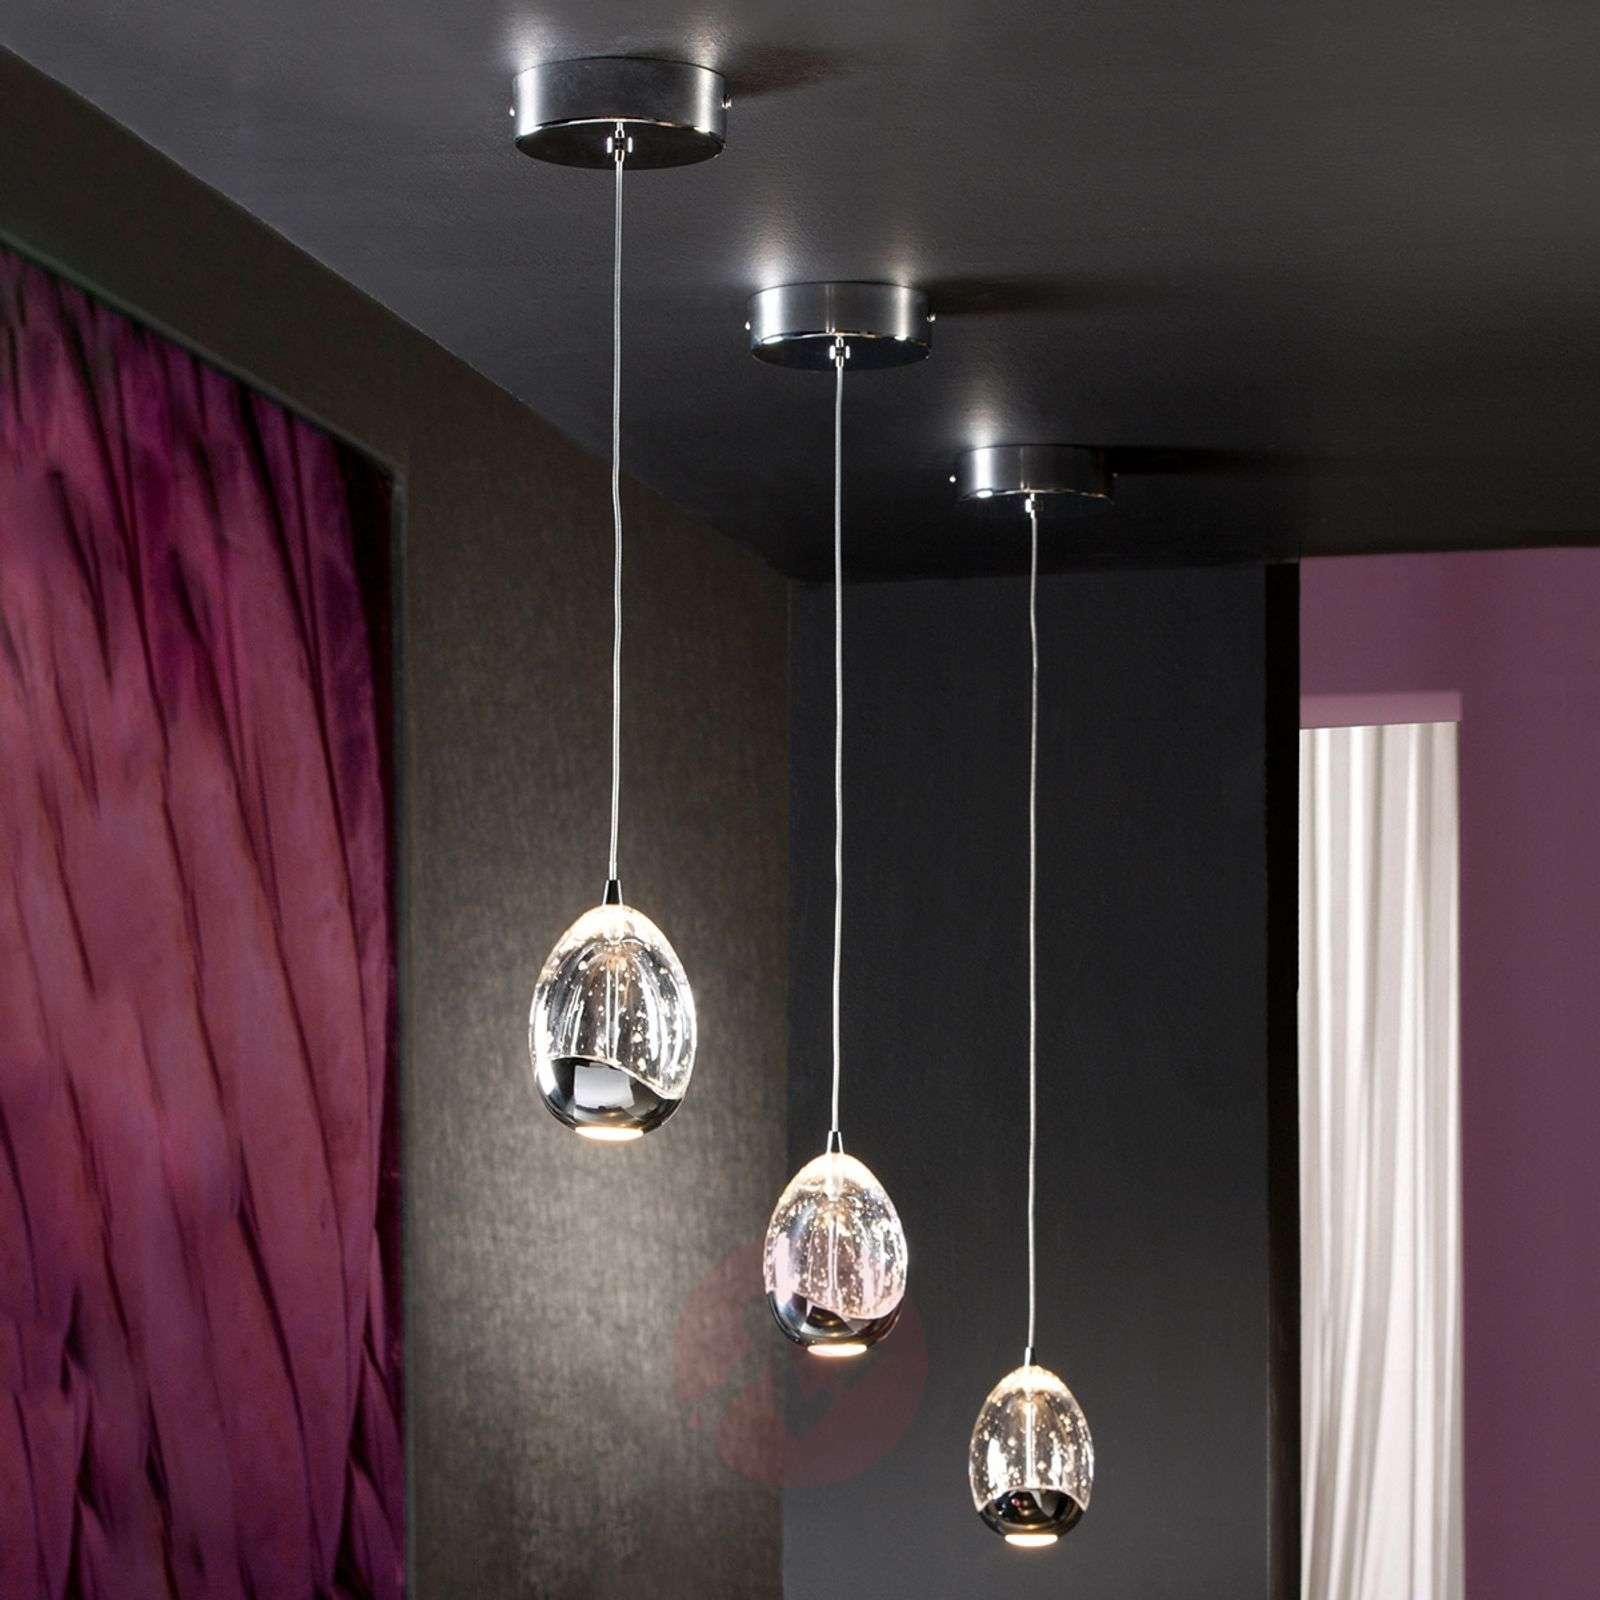 Single-light LED hanging light Rocio in chrome-8582200-01